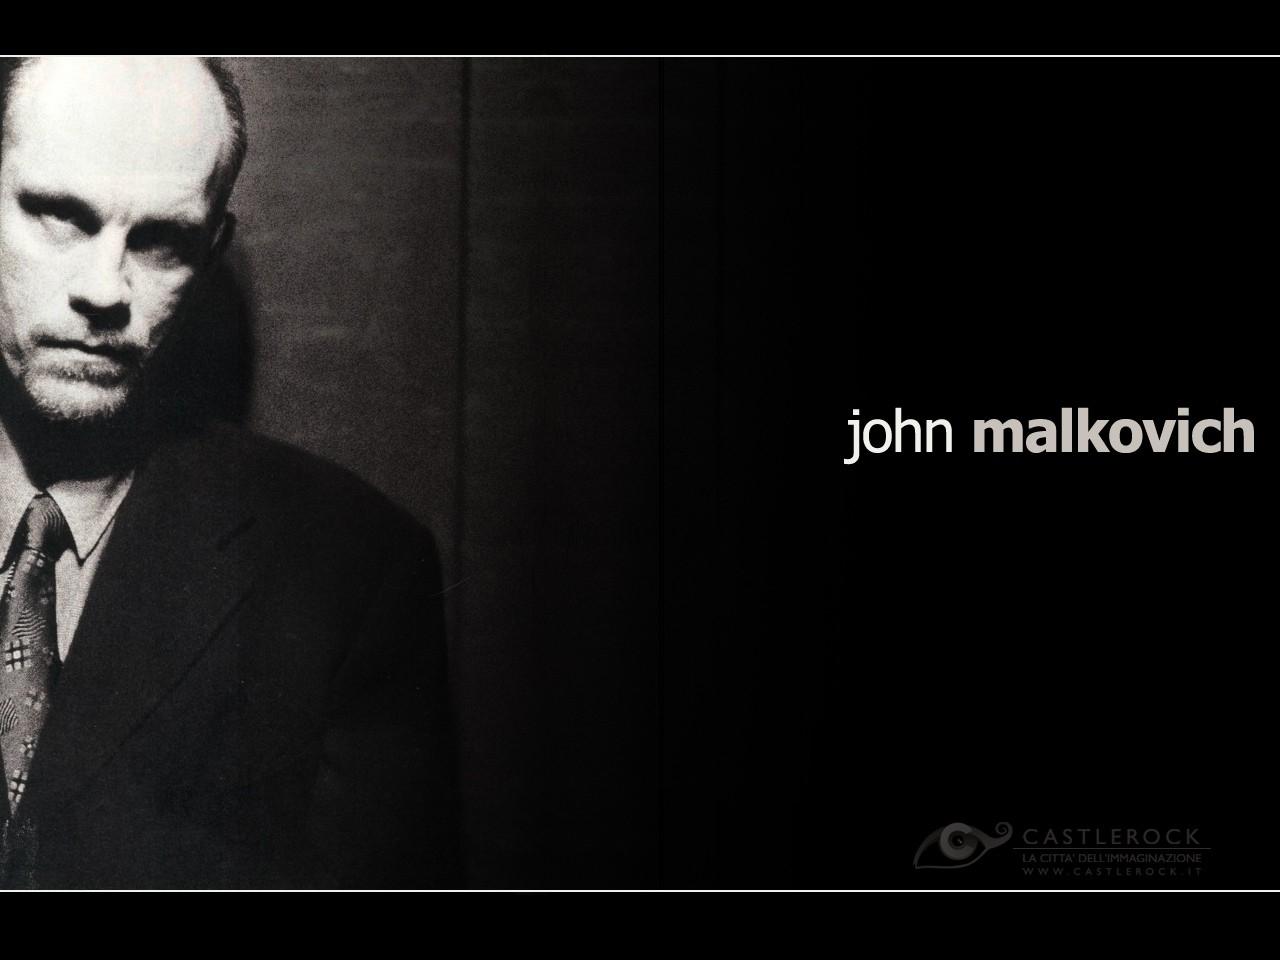 Wallpaper di John Malkovich